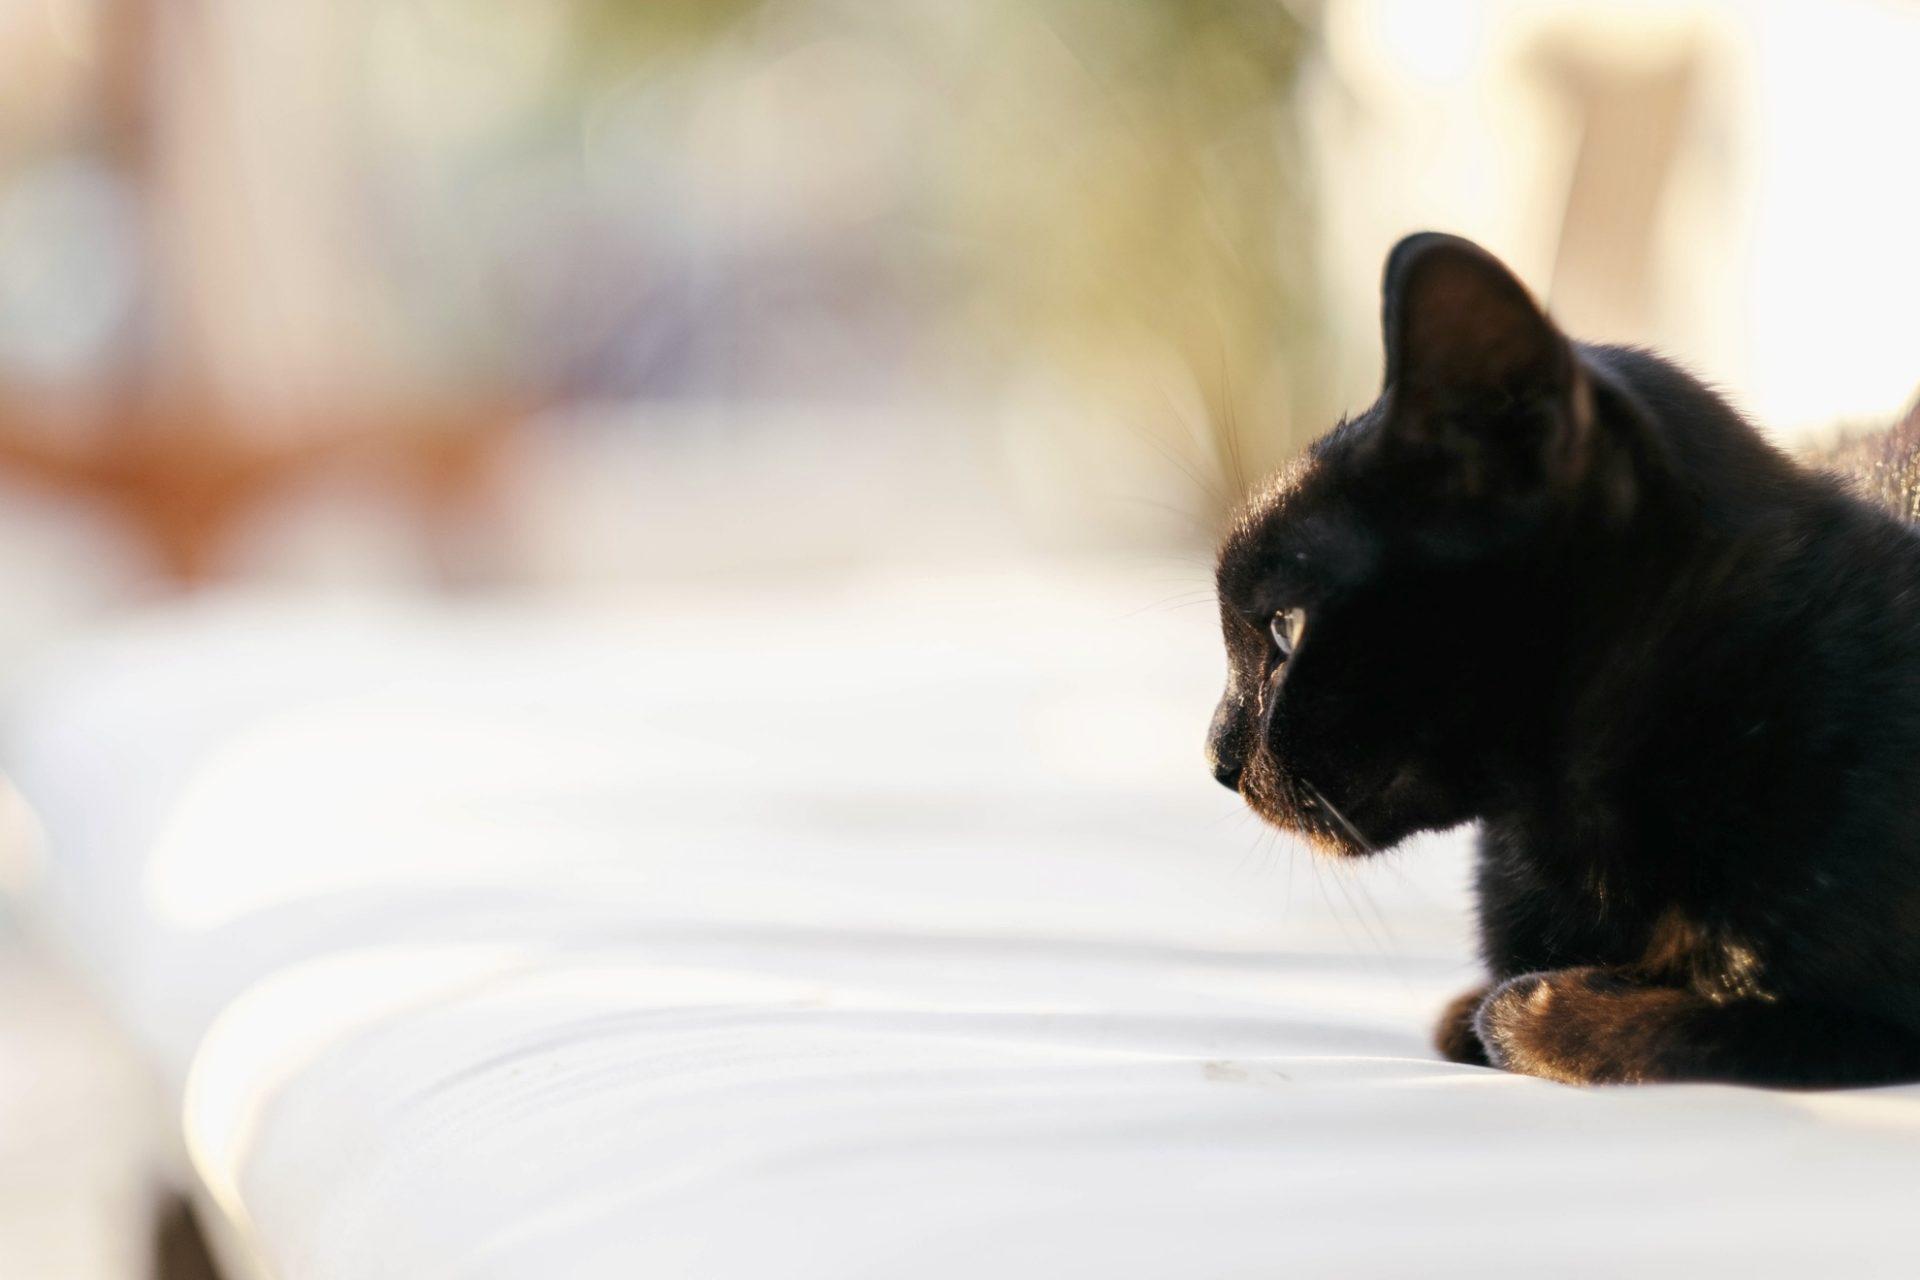 chats grecs@laurentparienti - 9